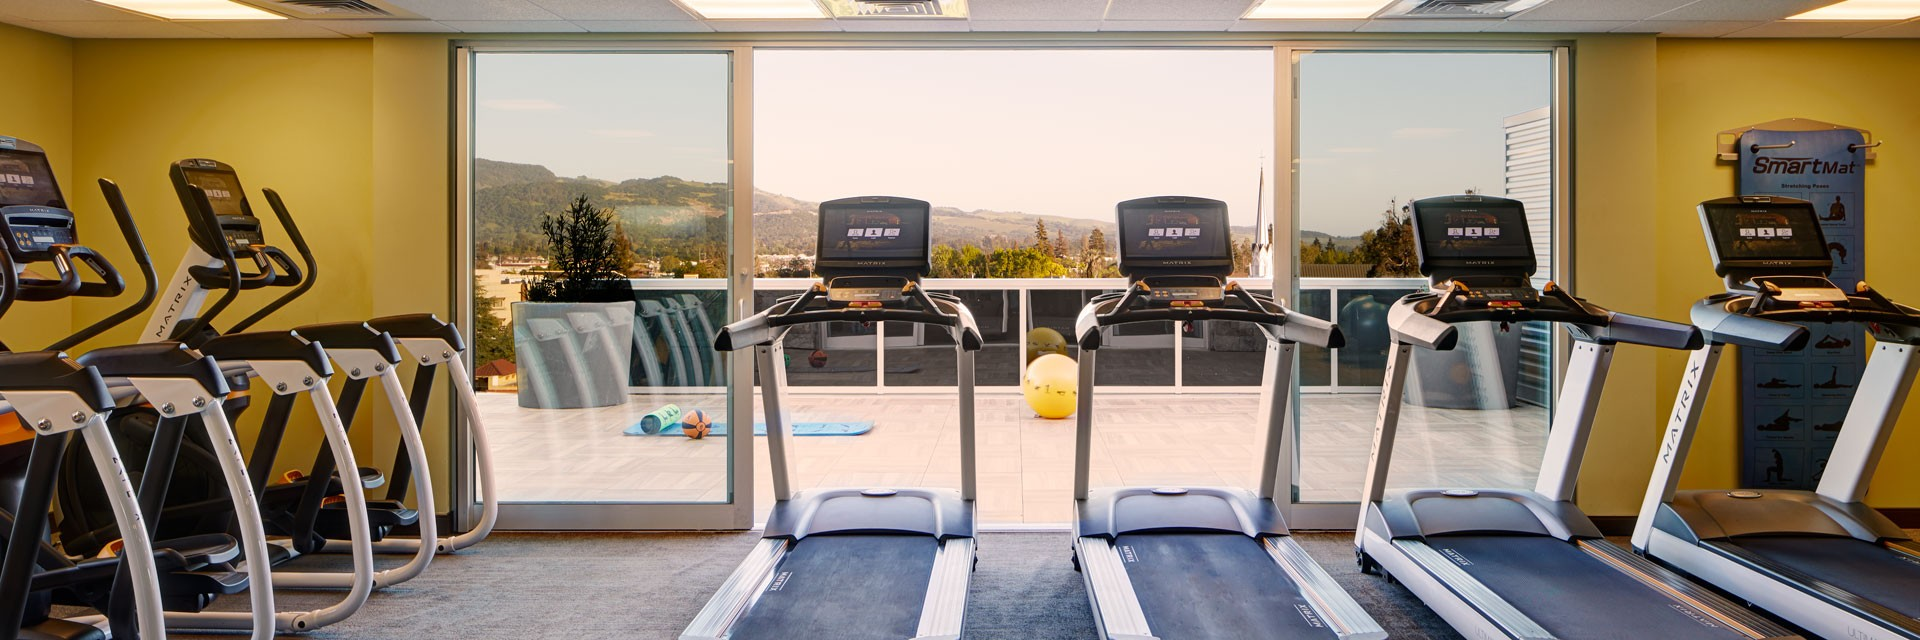 Archer Hotel Napa - Fitness studio cardio equipment